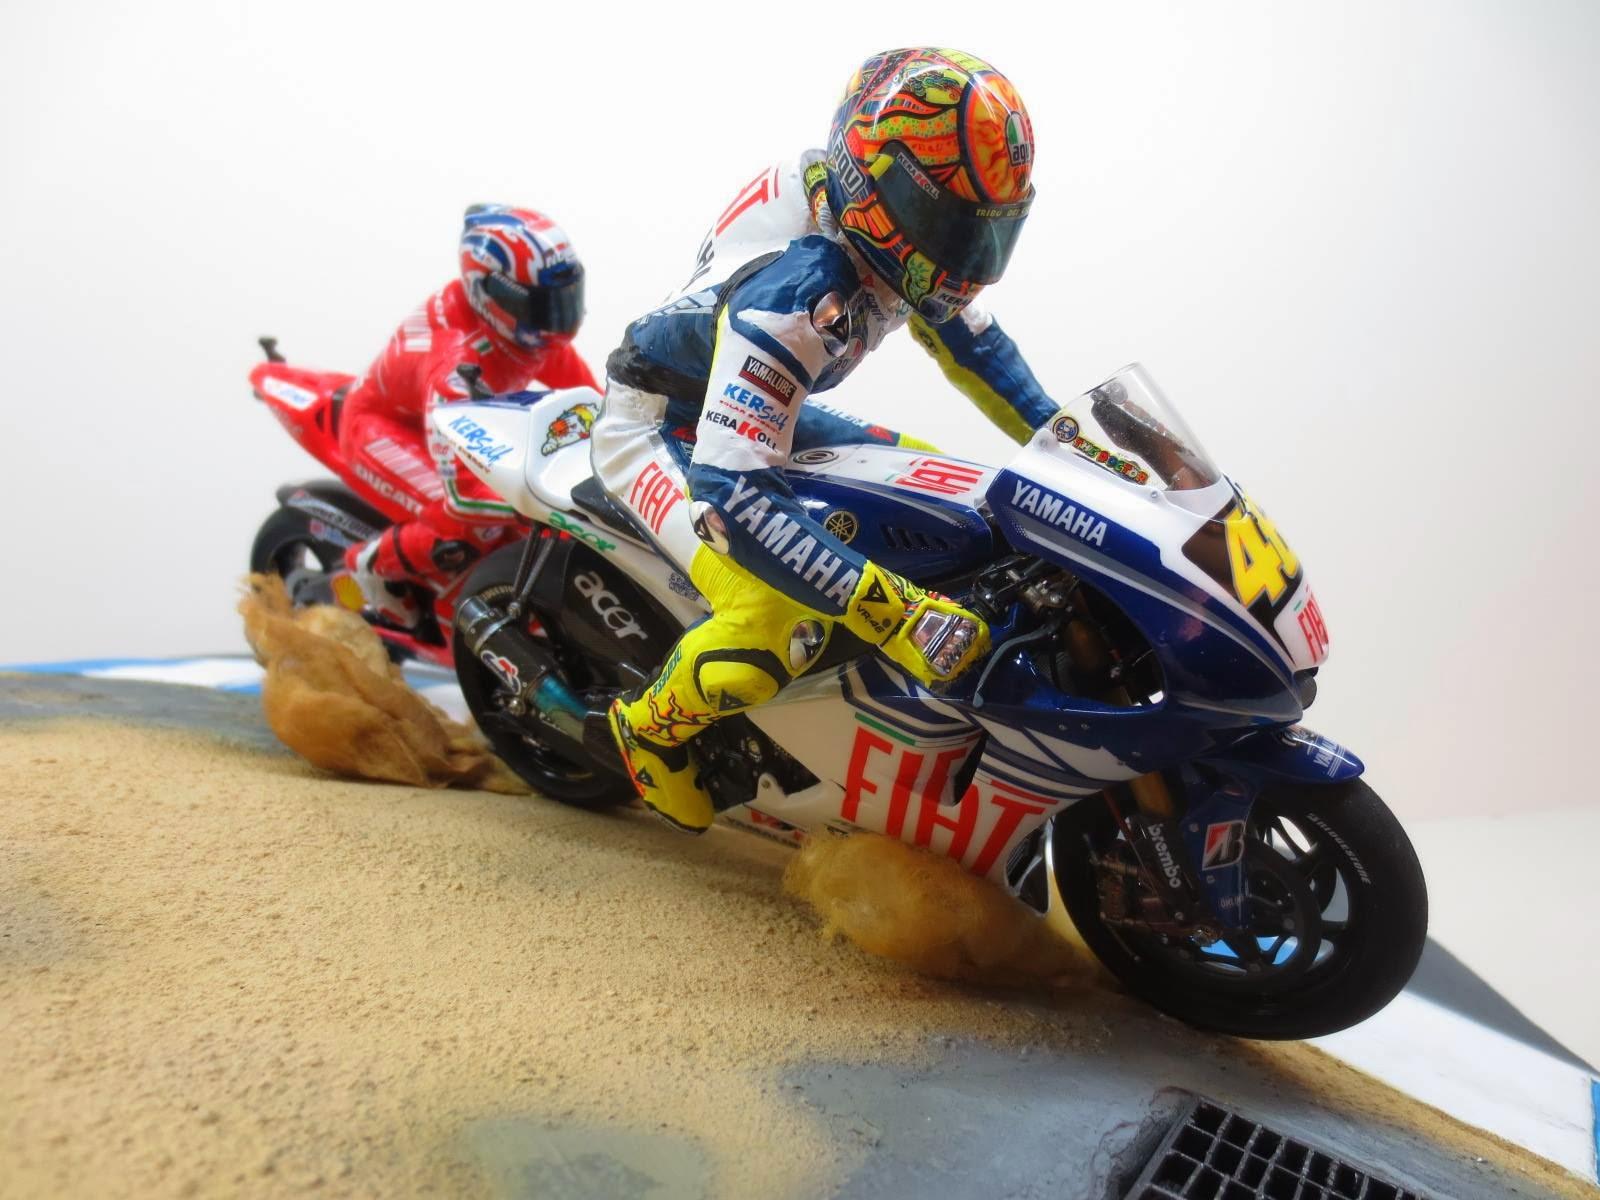 Racing Scale Models: Diorama - Casey Stoner VS Valentino Rossi - Laguna Seca 2008 by Tateo Chen